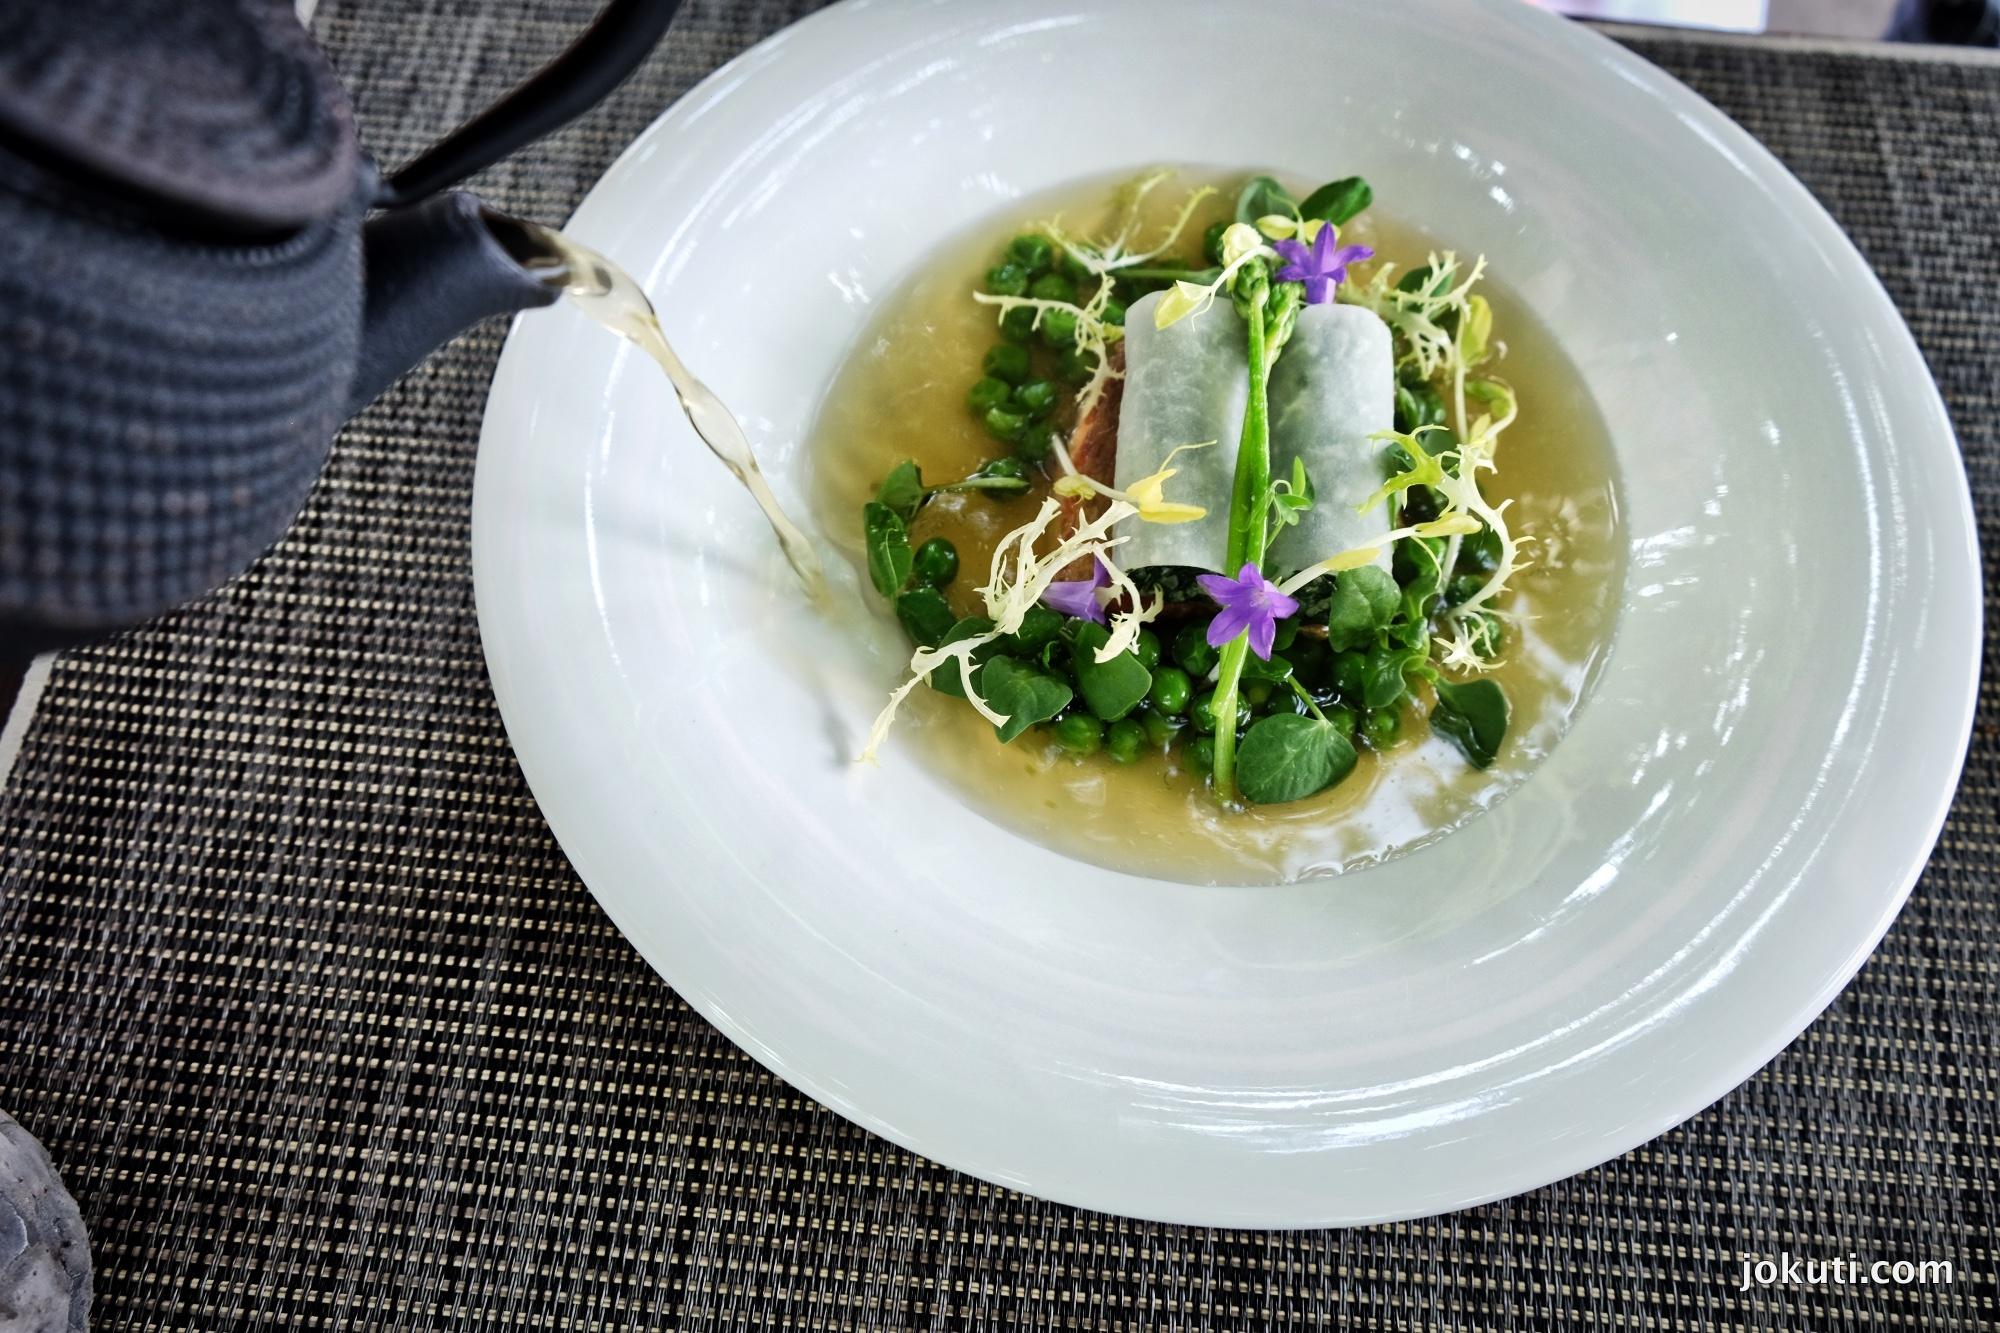 dscf6959_platan_tata_pesti_restaurant_denmark_vilagevo_jokuti_andras_l_l.jpg